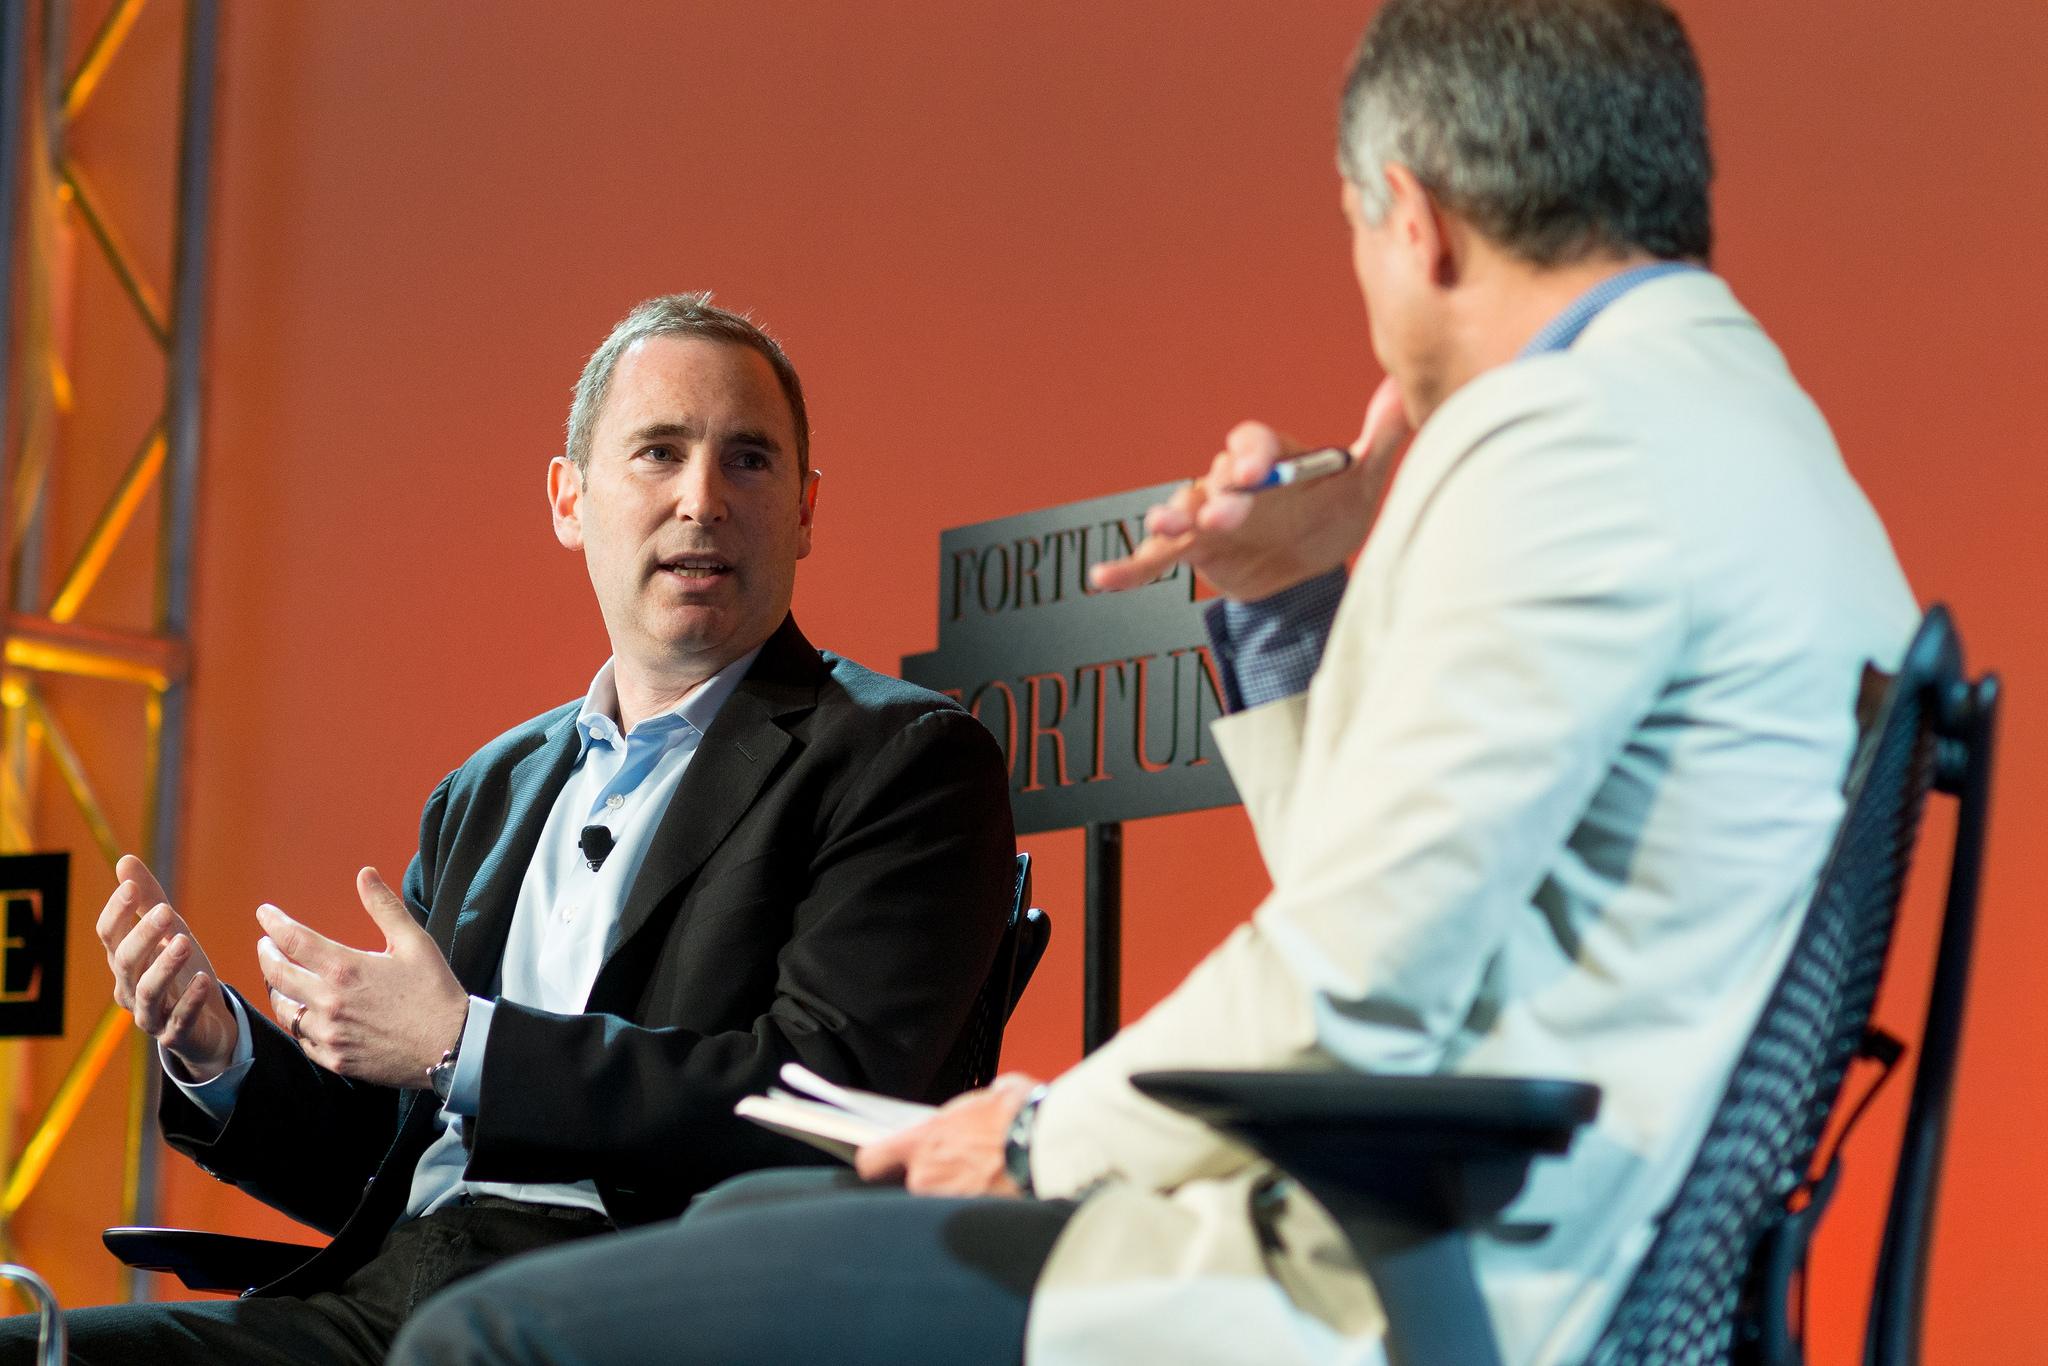 Andy Jassy, SVP, Web Services, Amazon.com Interviewer: Adam Lashinsky, Fortune